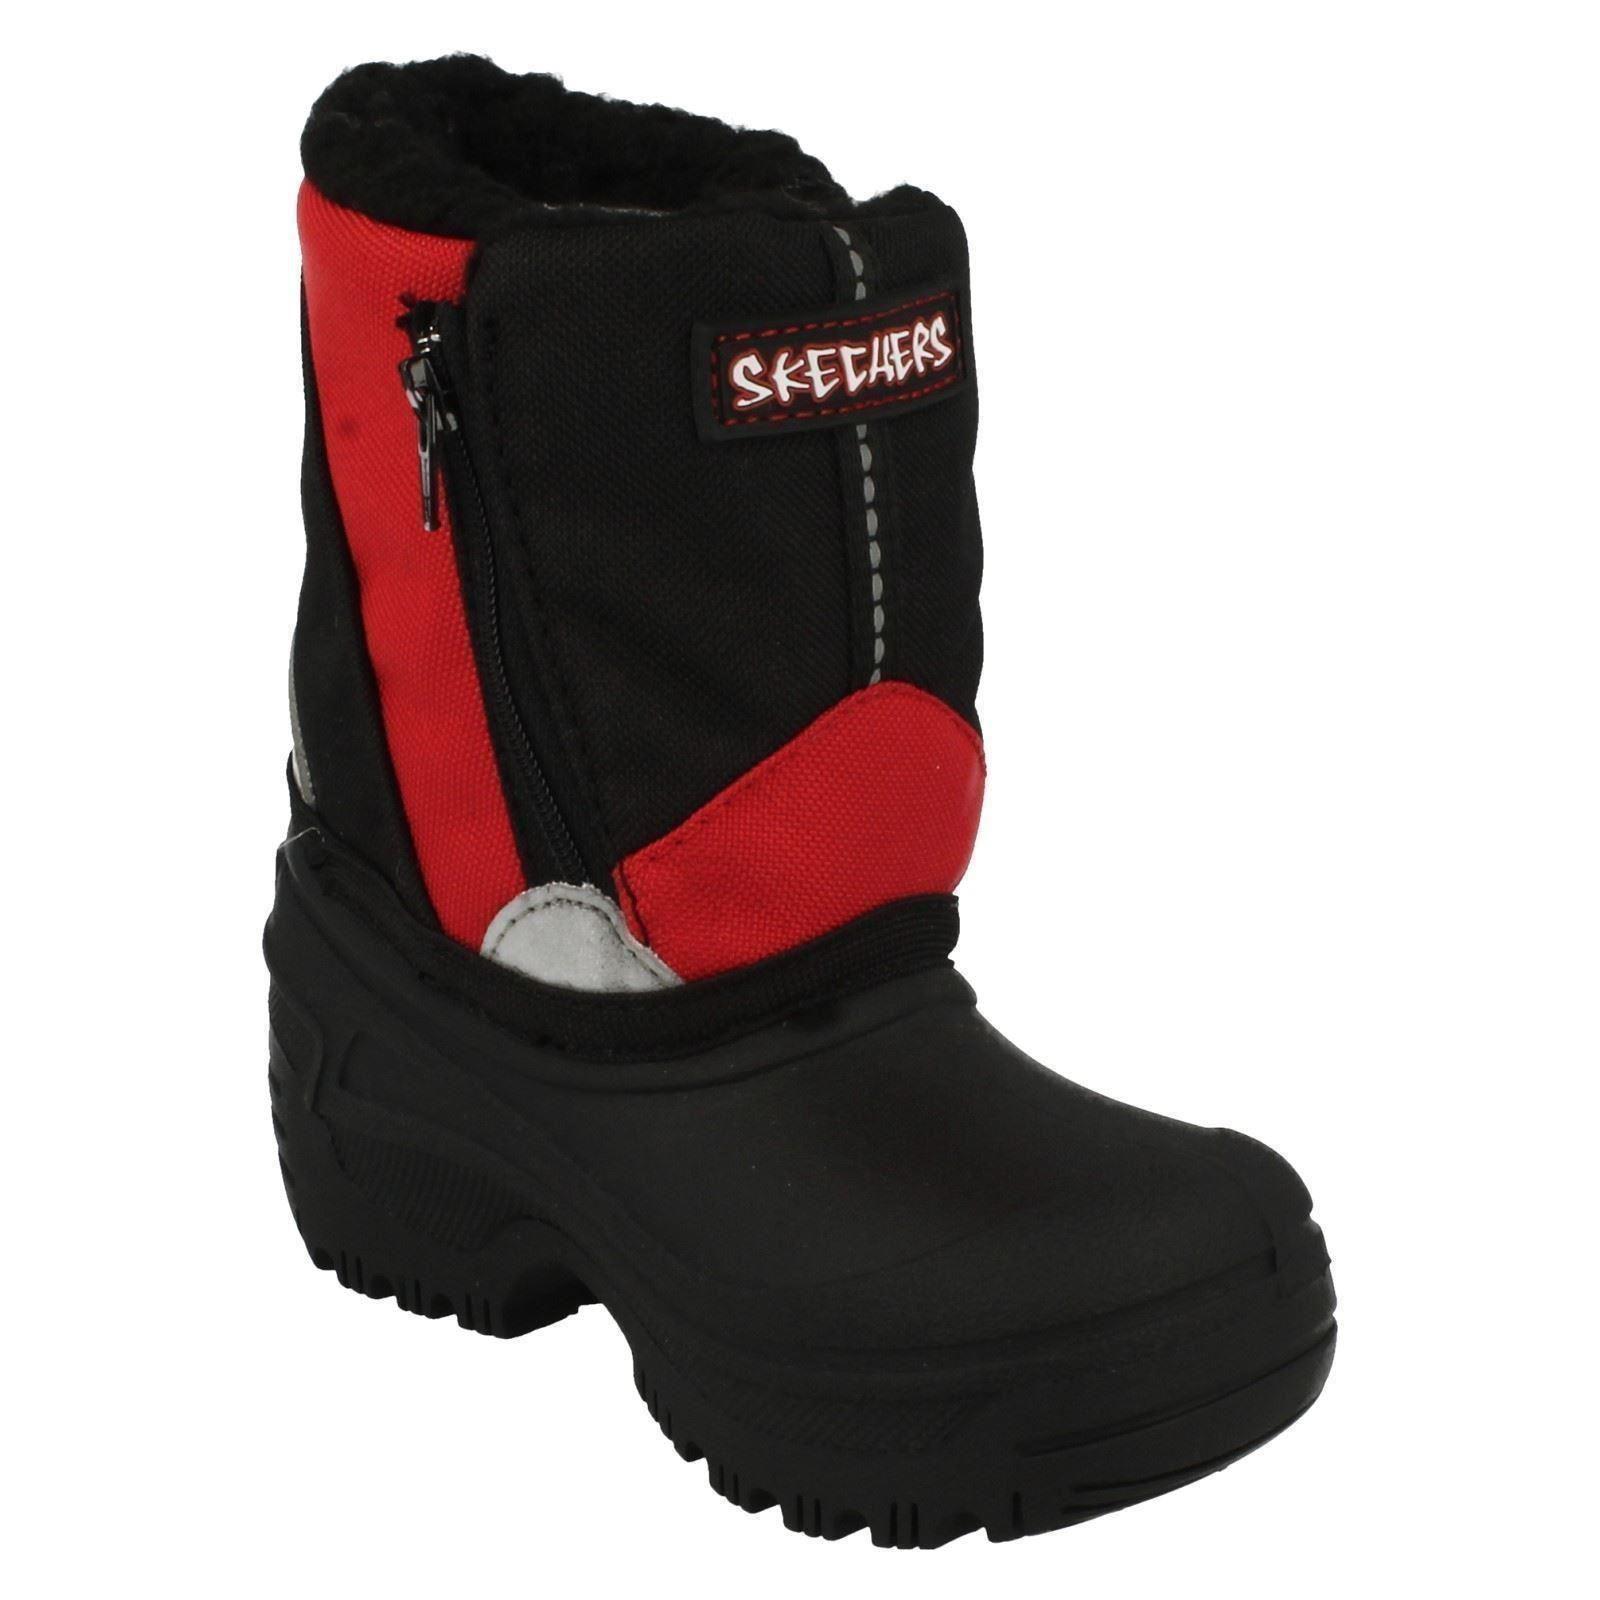 01042f75baad6 Boys Skechers Mor-Tex Water Resistant Snow Boots Carbuncle 96061N